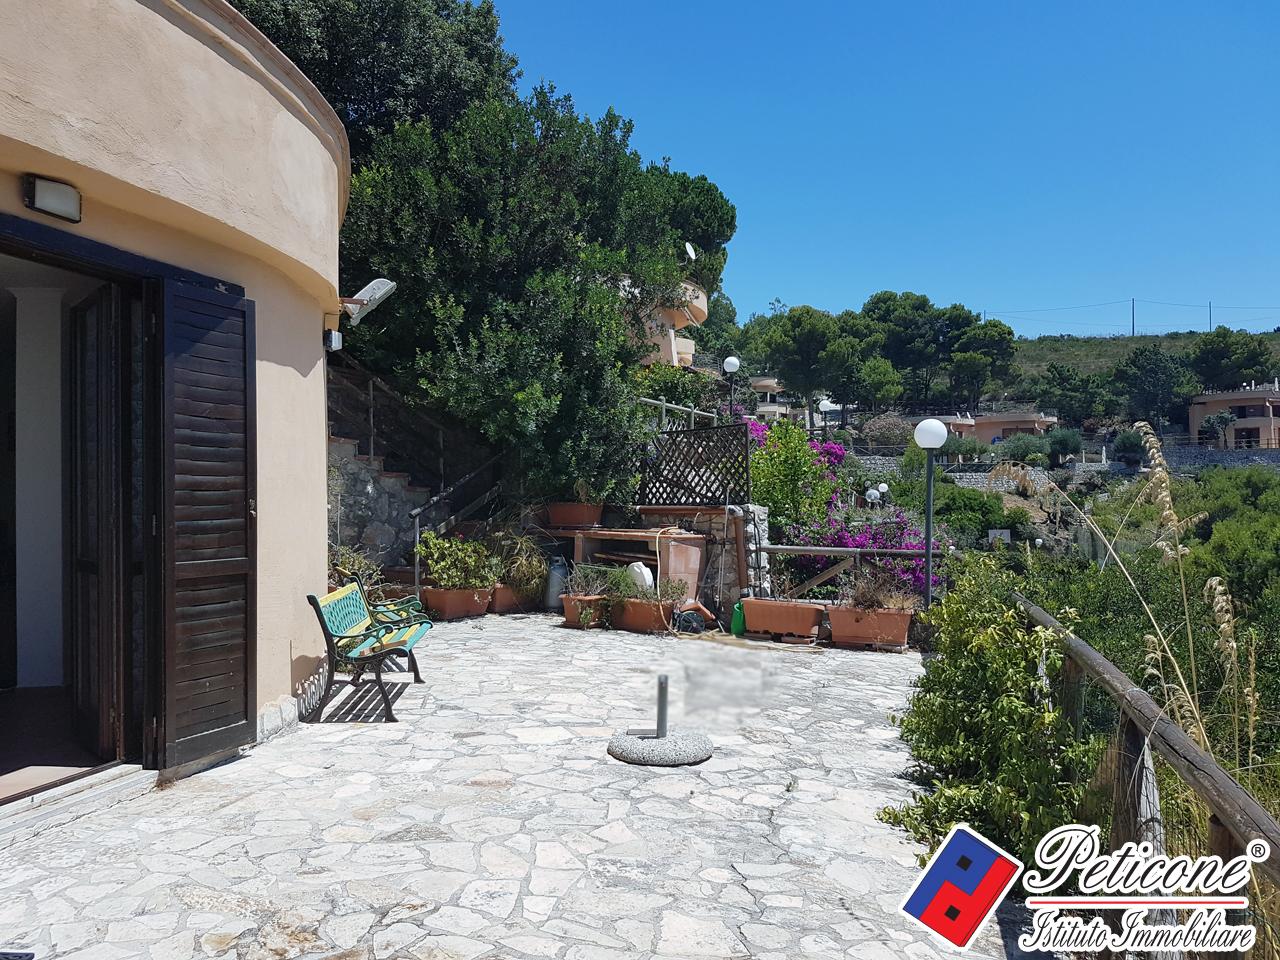 Villa in Vendita a Sperlonga: 4 locali, 90 mq - Foto 15